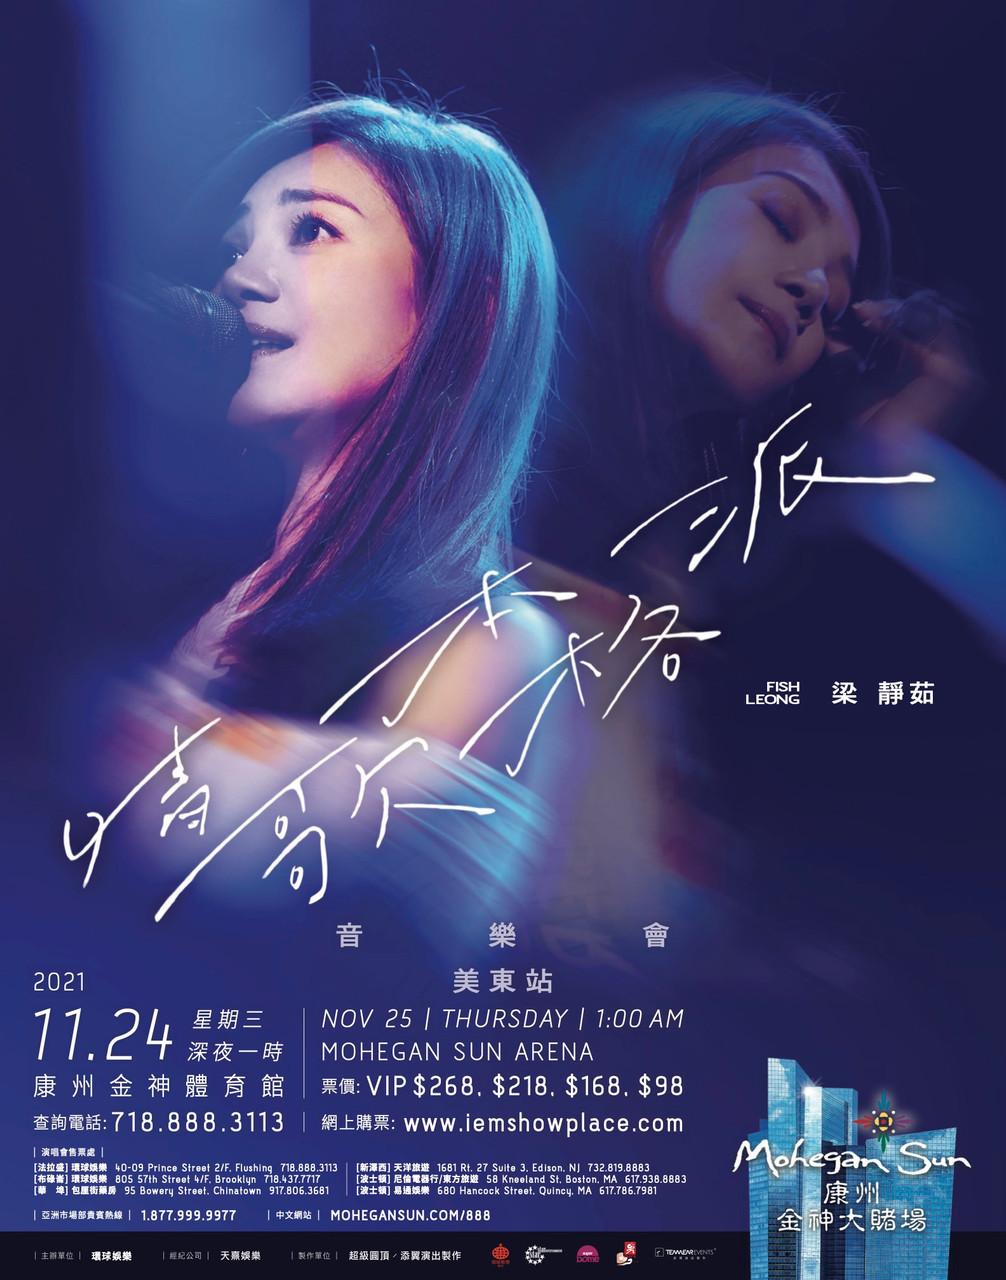 poster -  Fish Leong Mohegan Sun